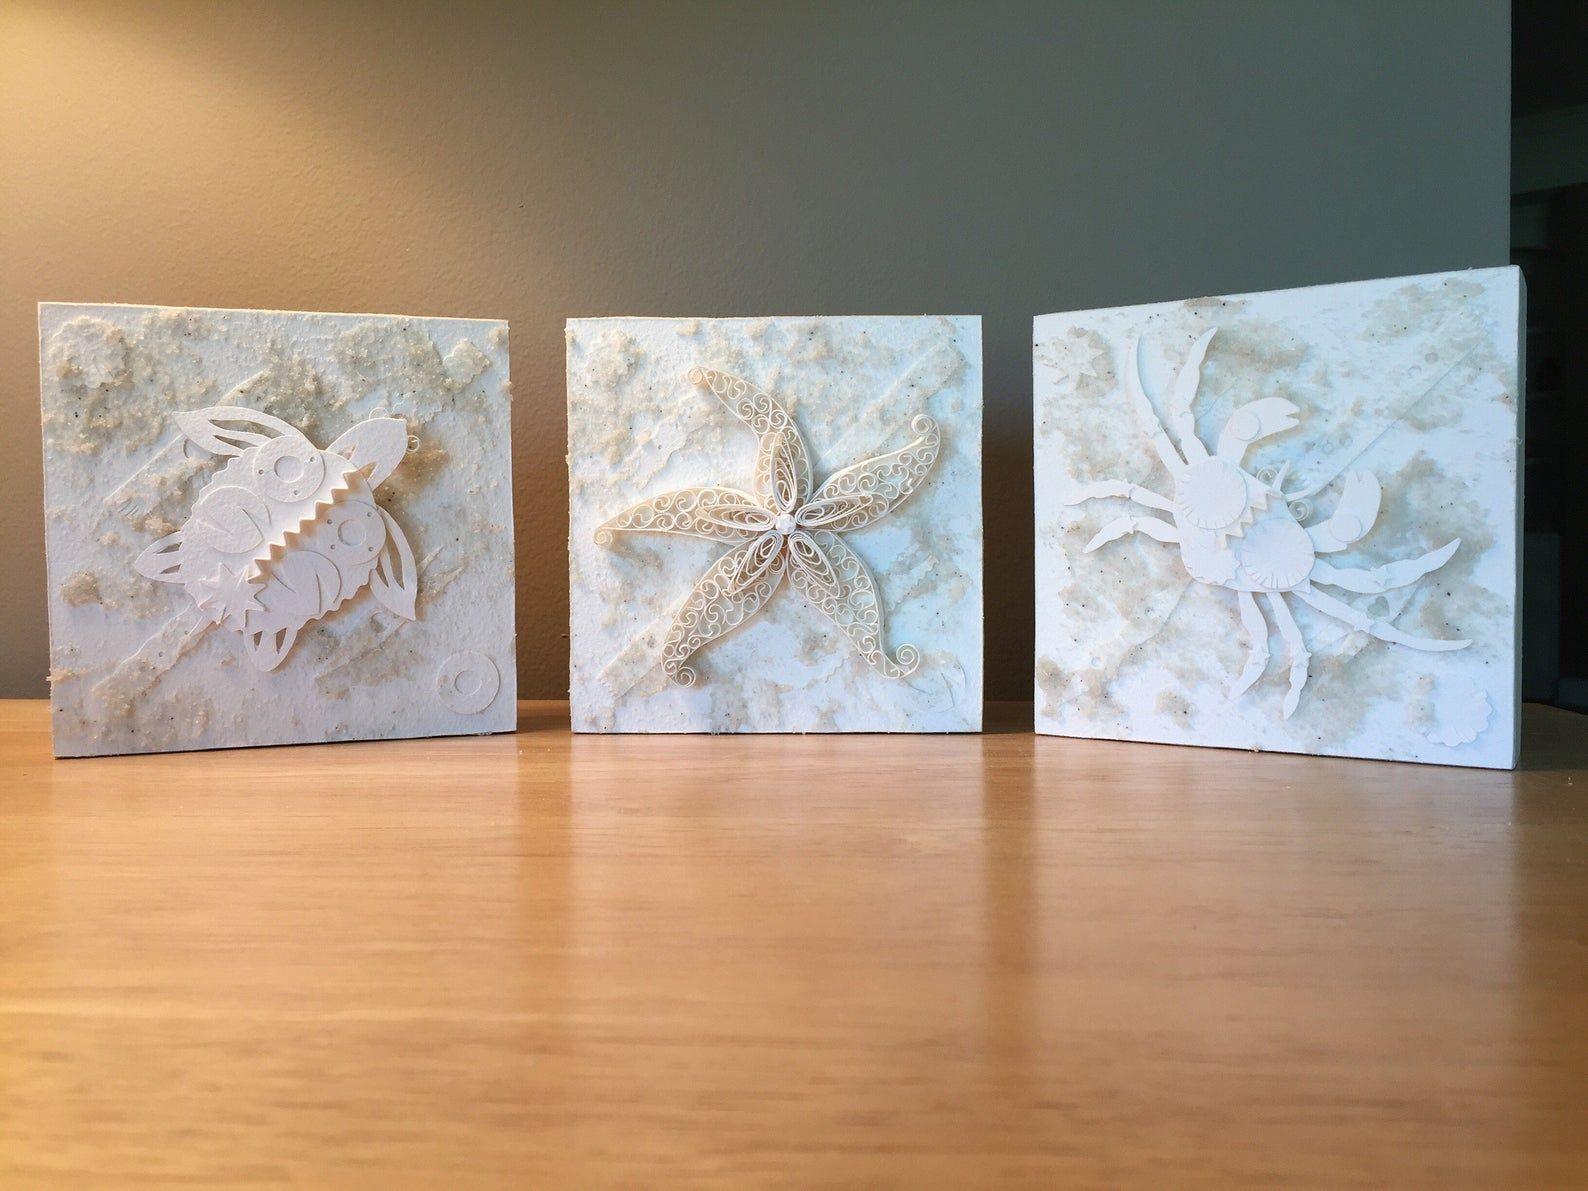 1st anniversary paper art coastal decor beach art FREE SHIPPING Starfish art 5x5